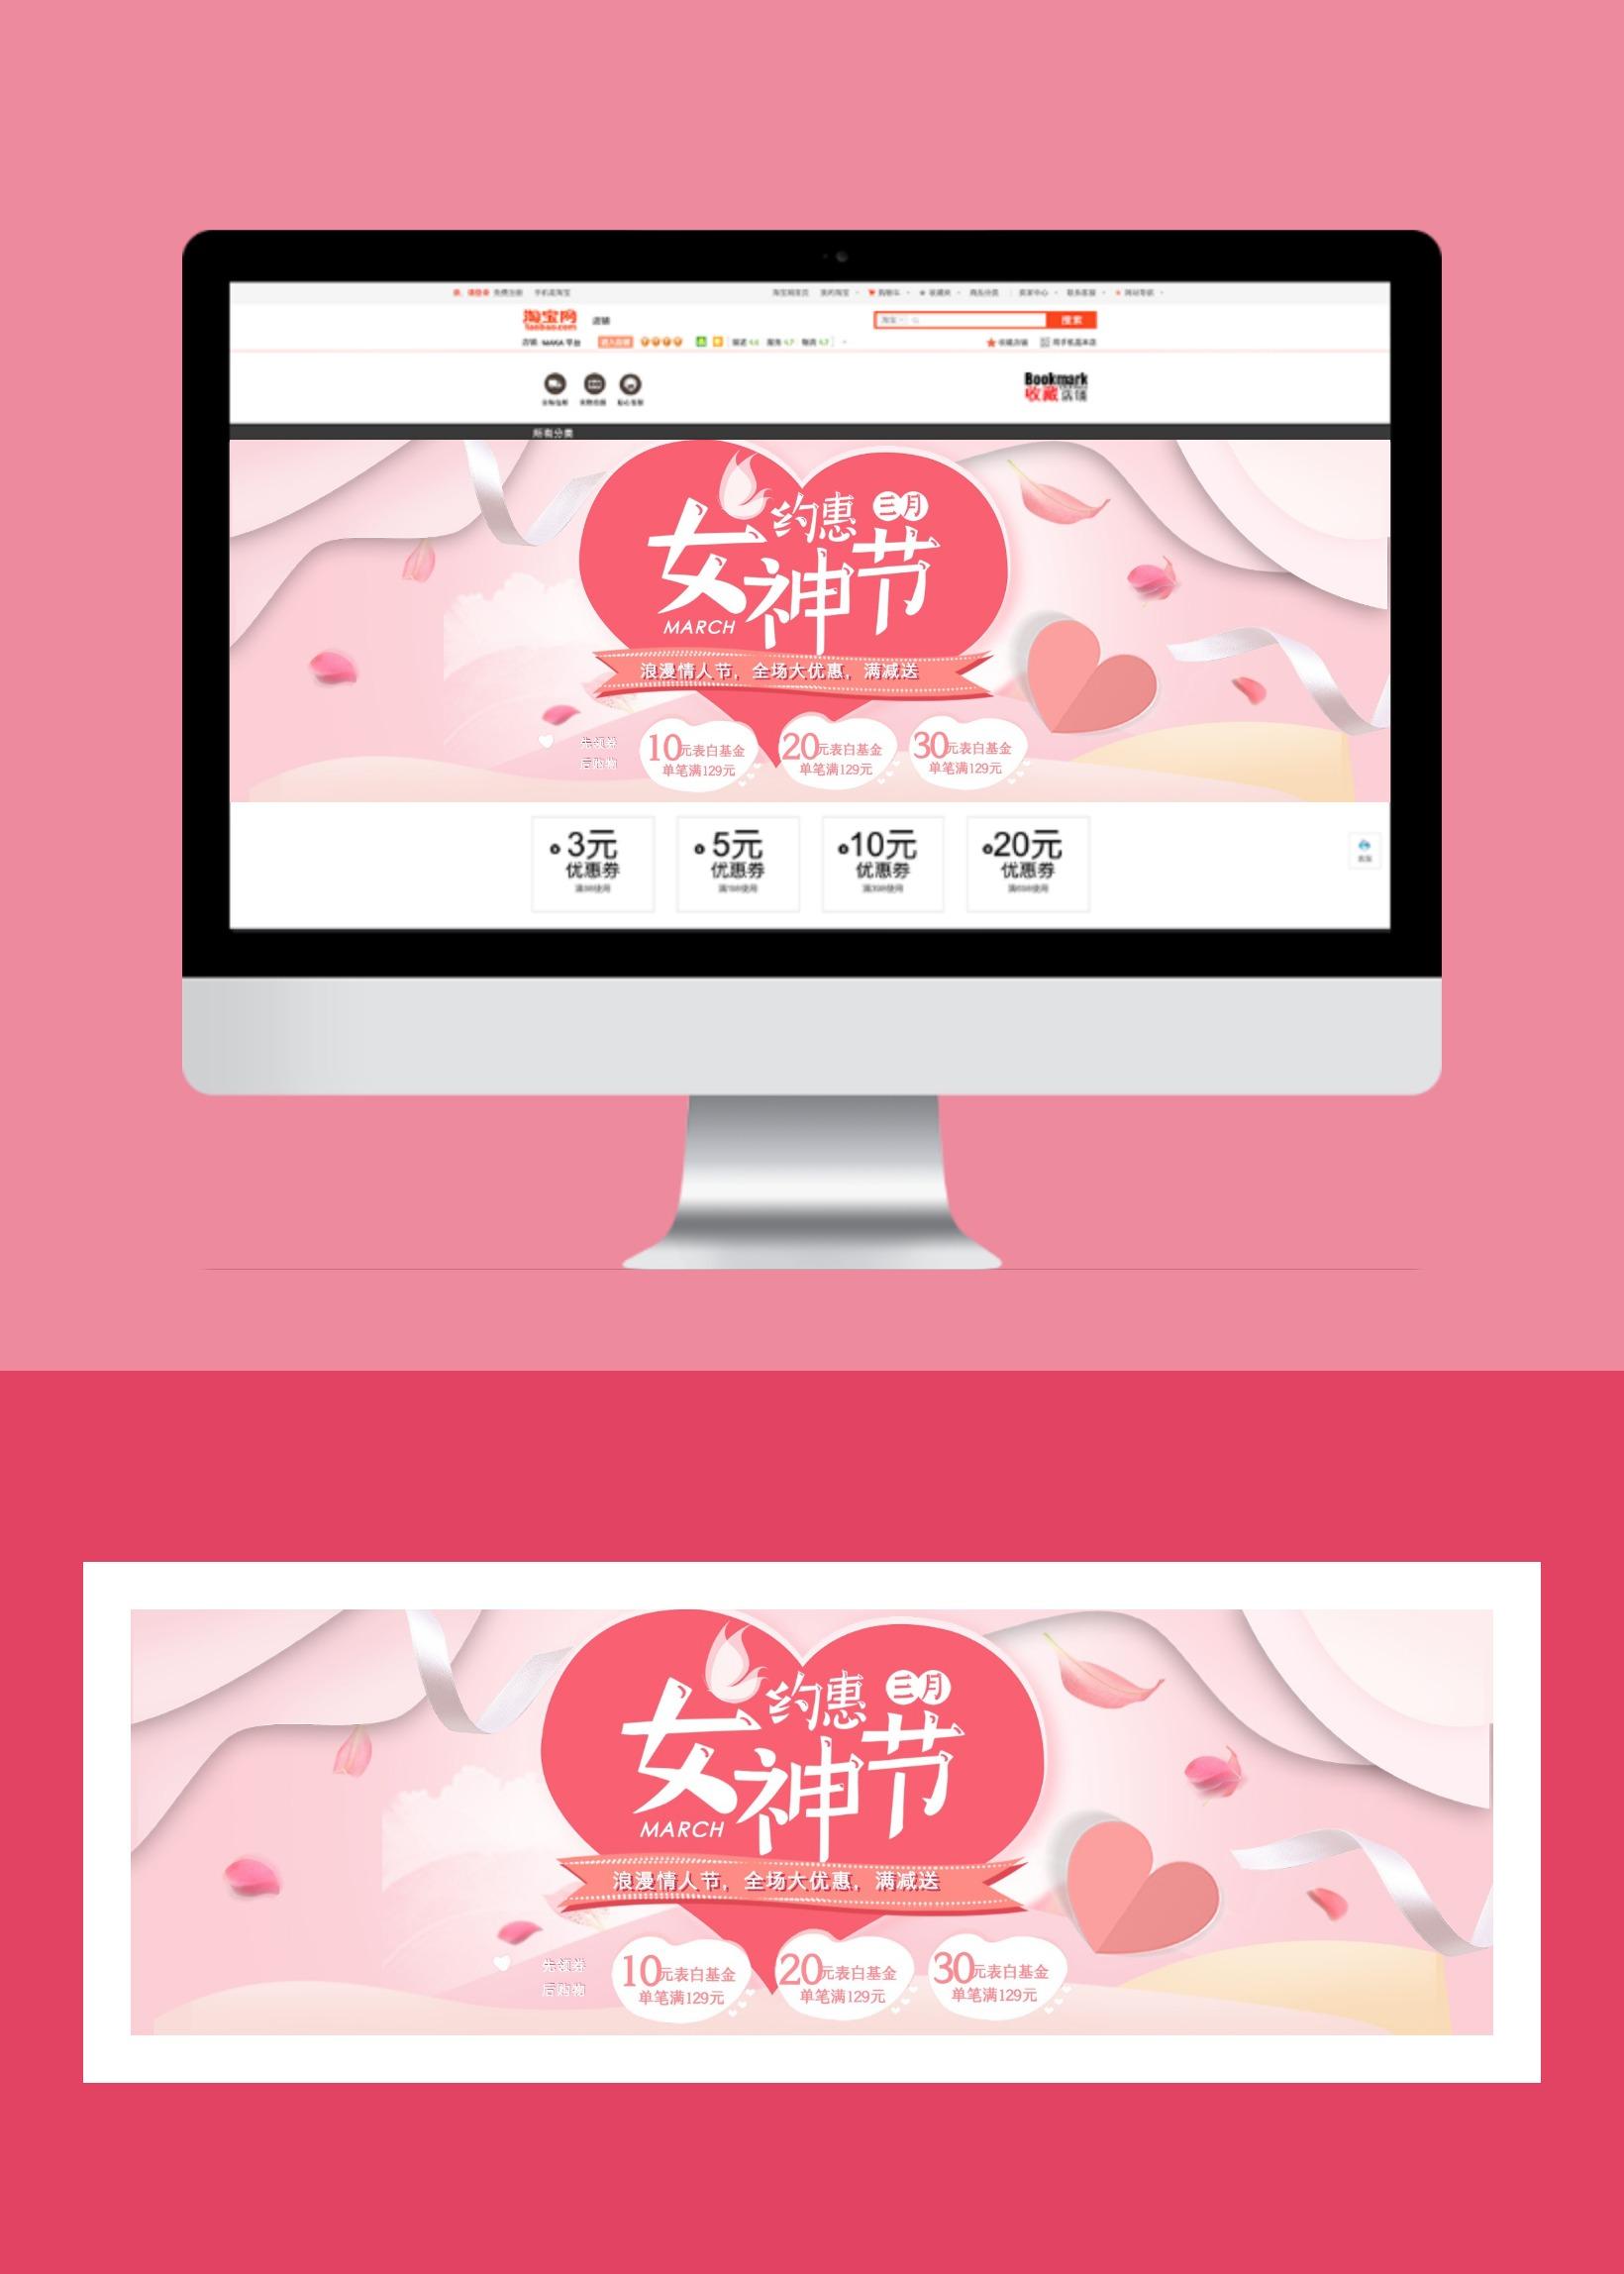 38妇女节粉色少女化妆品活动促销banner